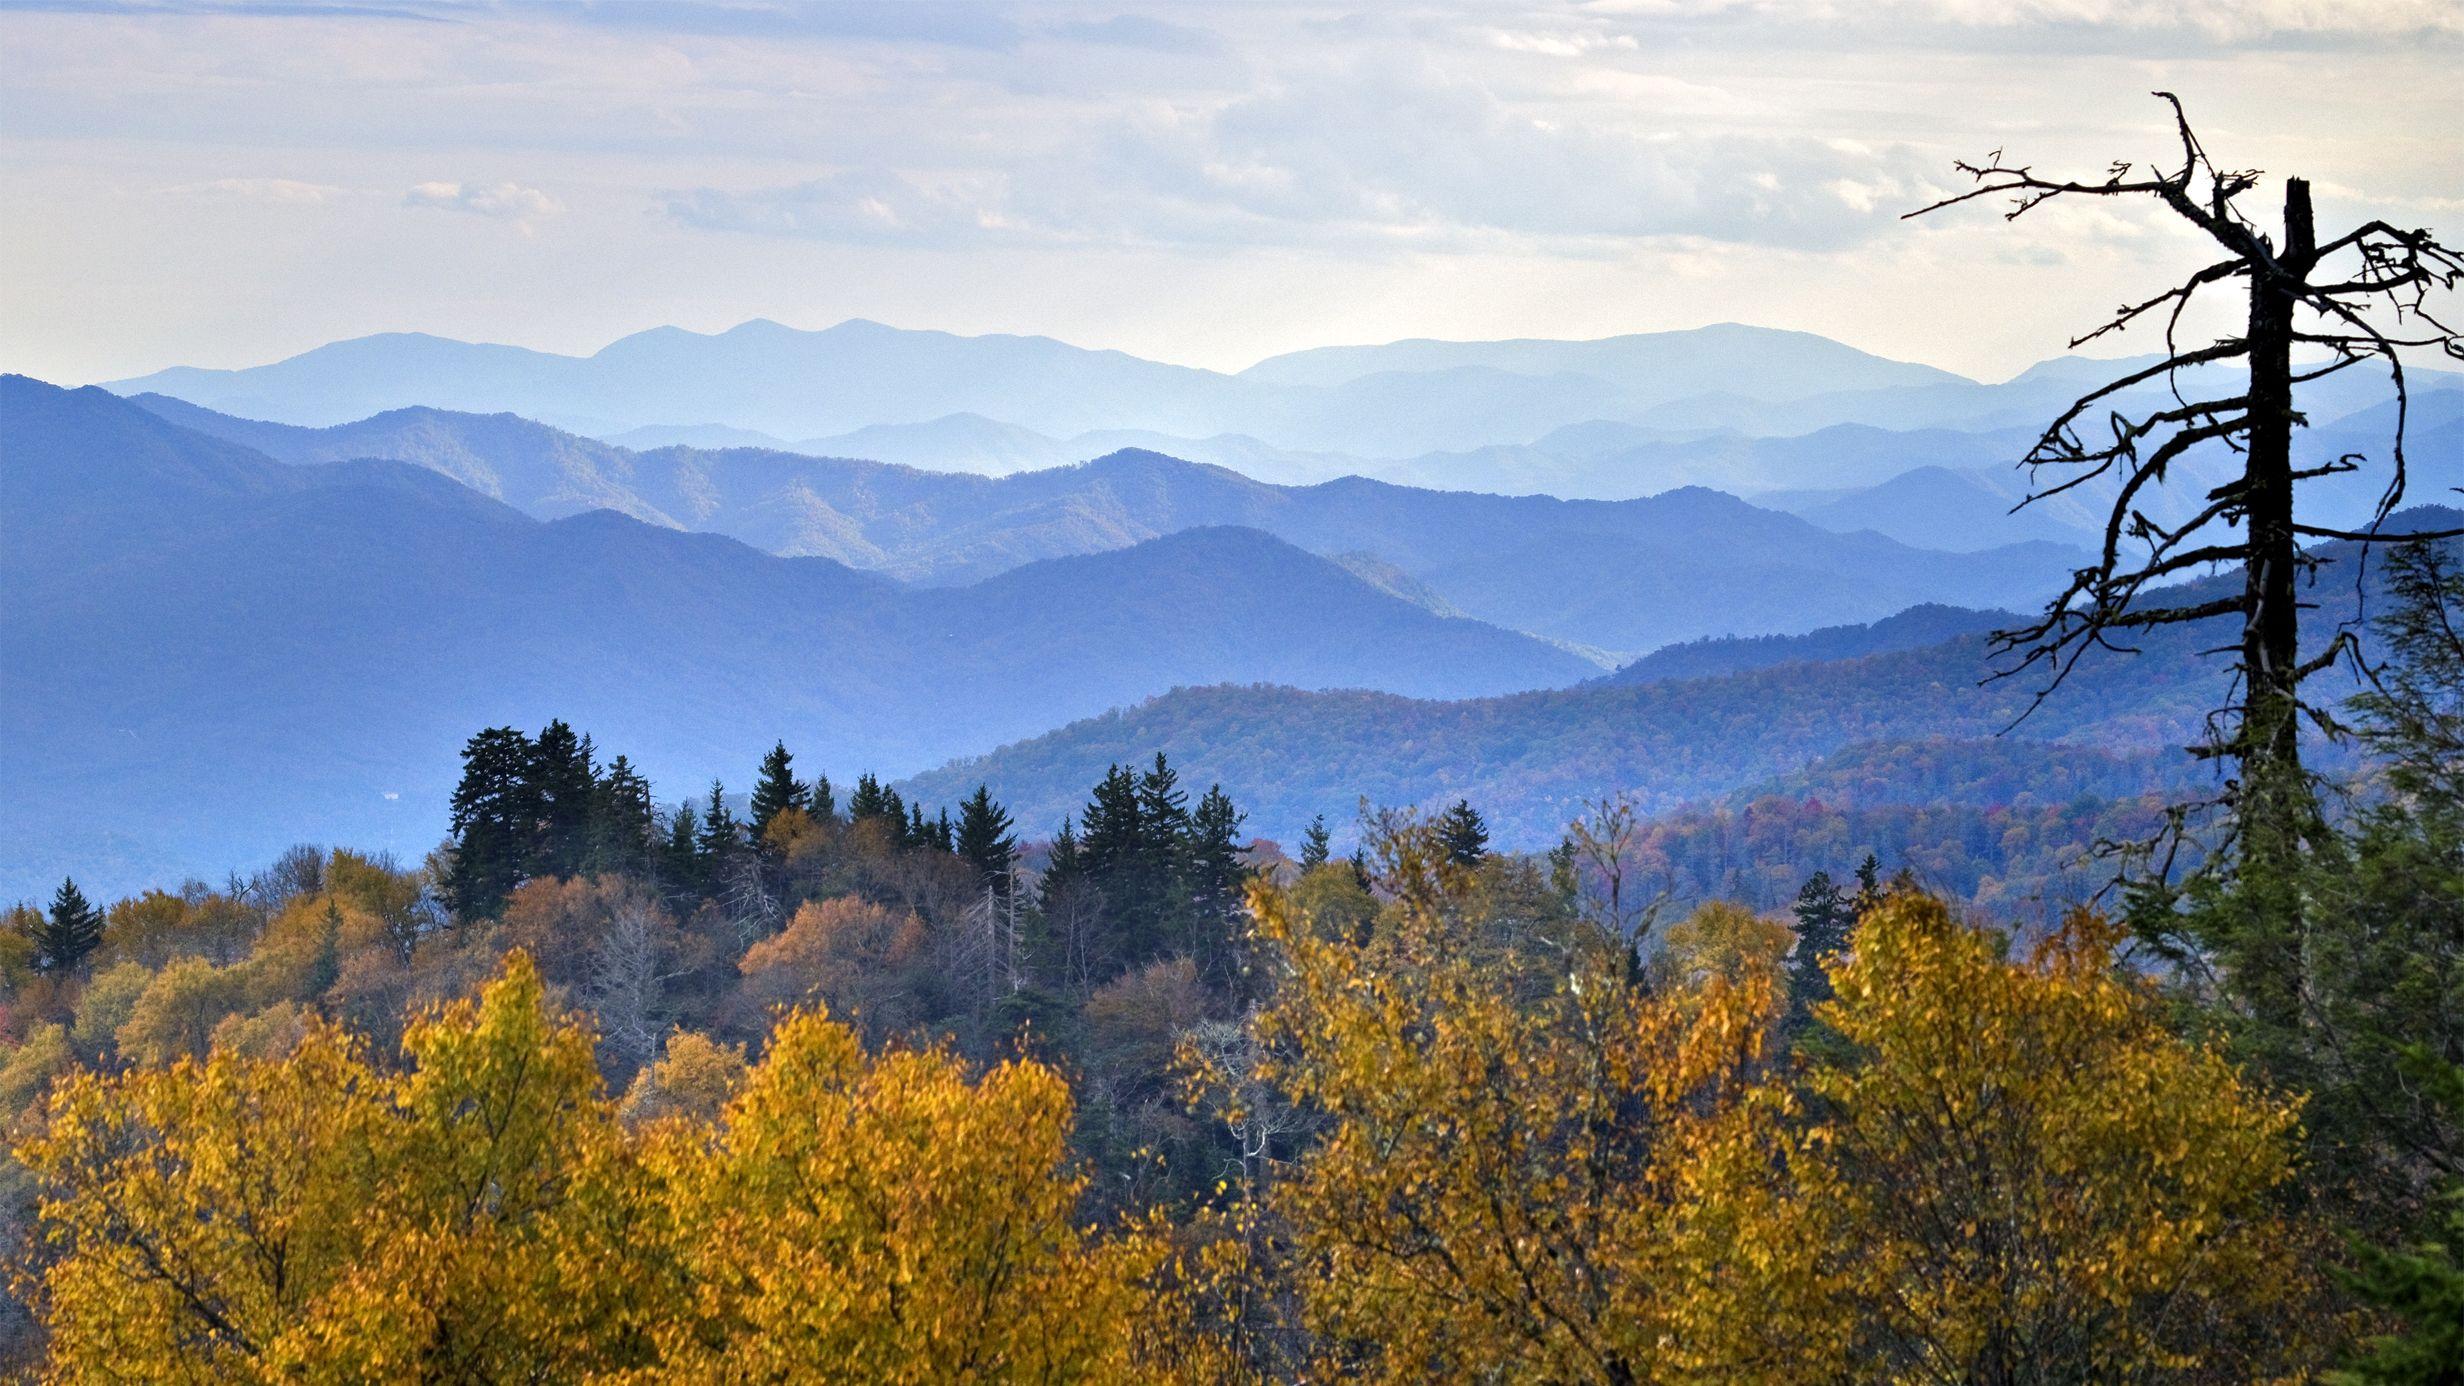 Wallpapers Catalogue Com River Of Fog Great Smoky Mountains Scenic Smoky Mountains Great Smoky Mountains